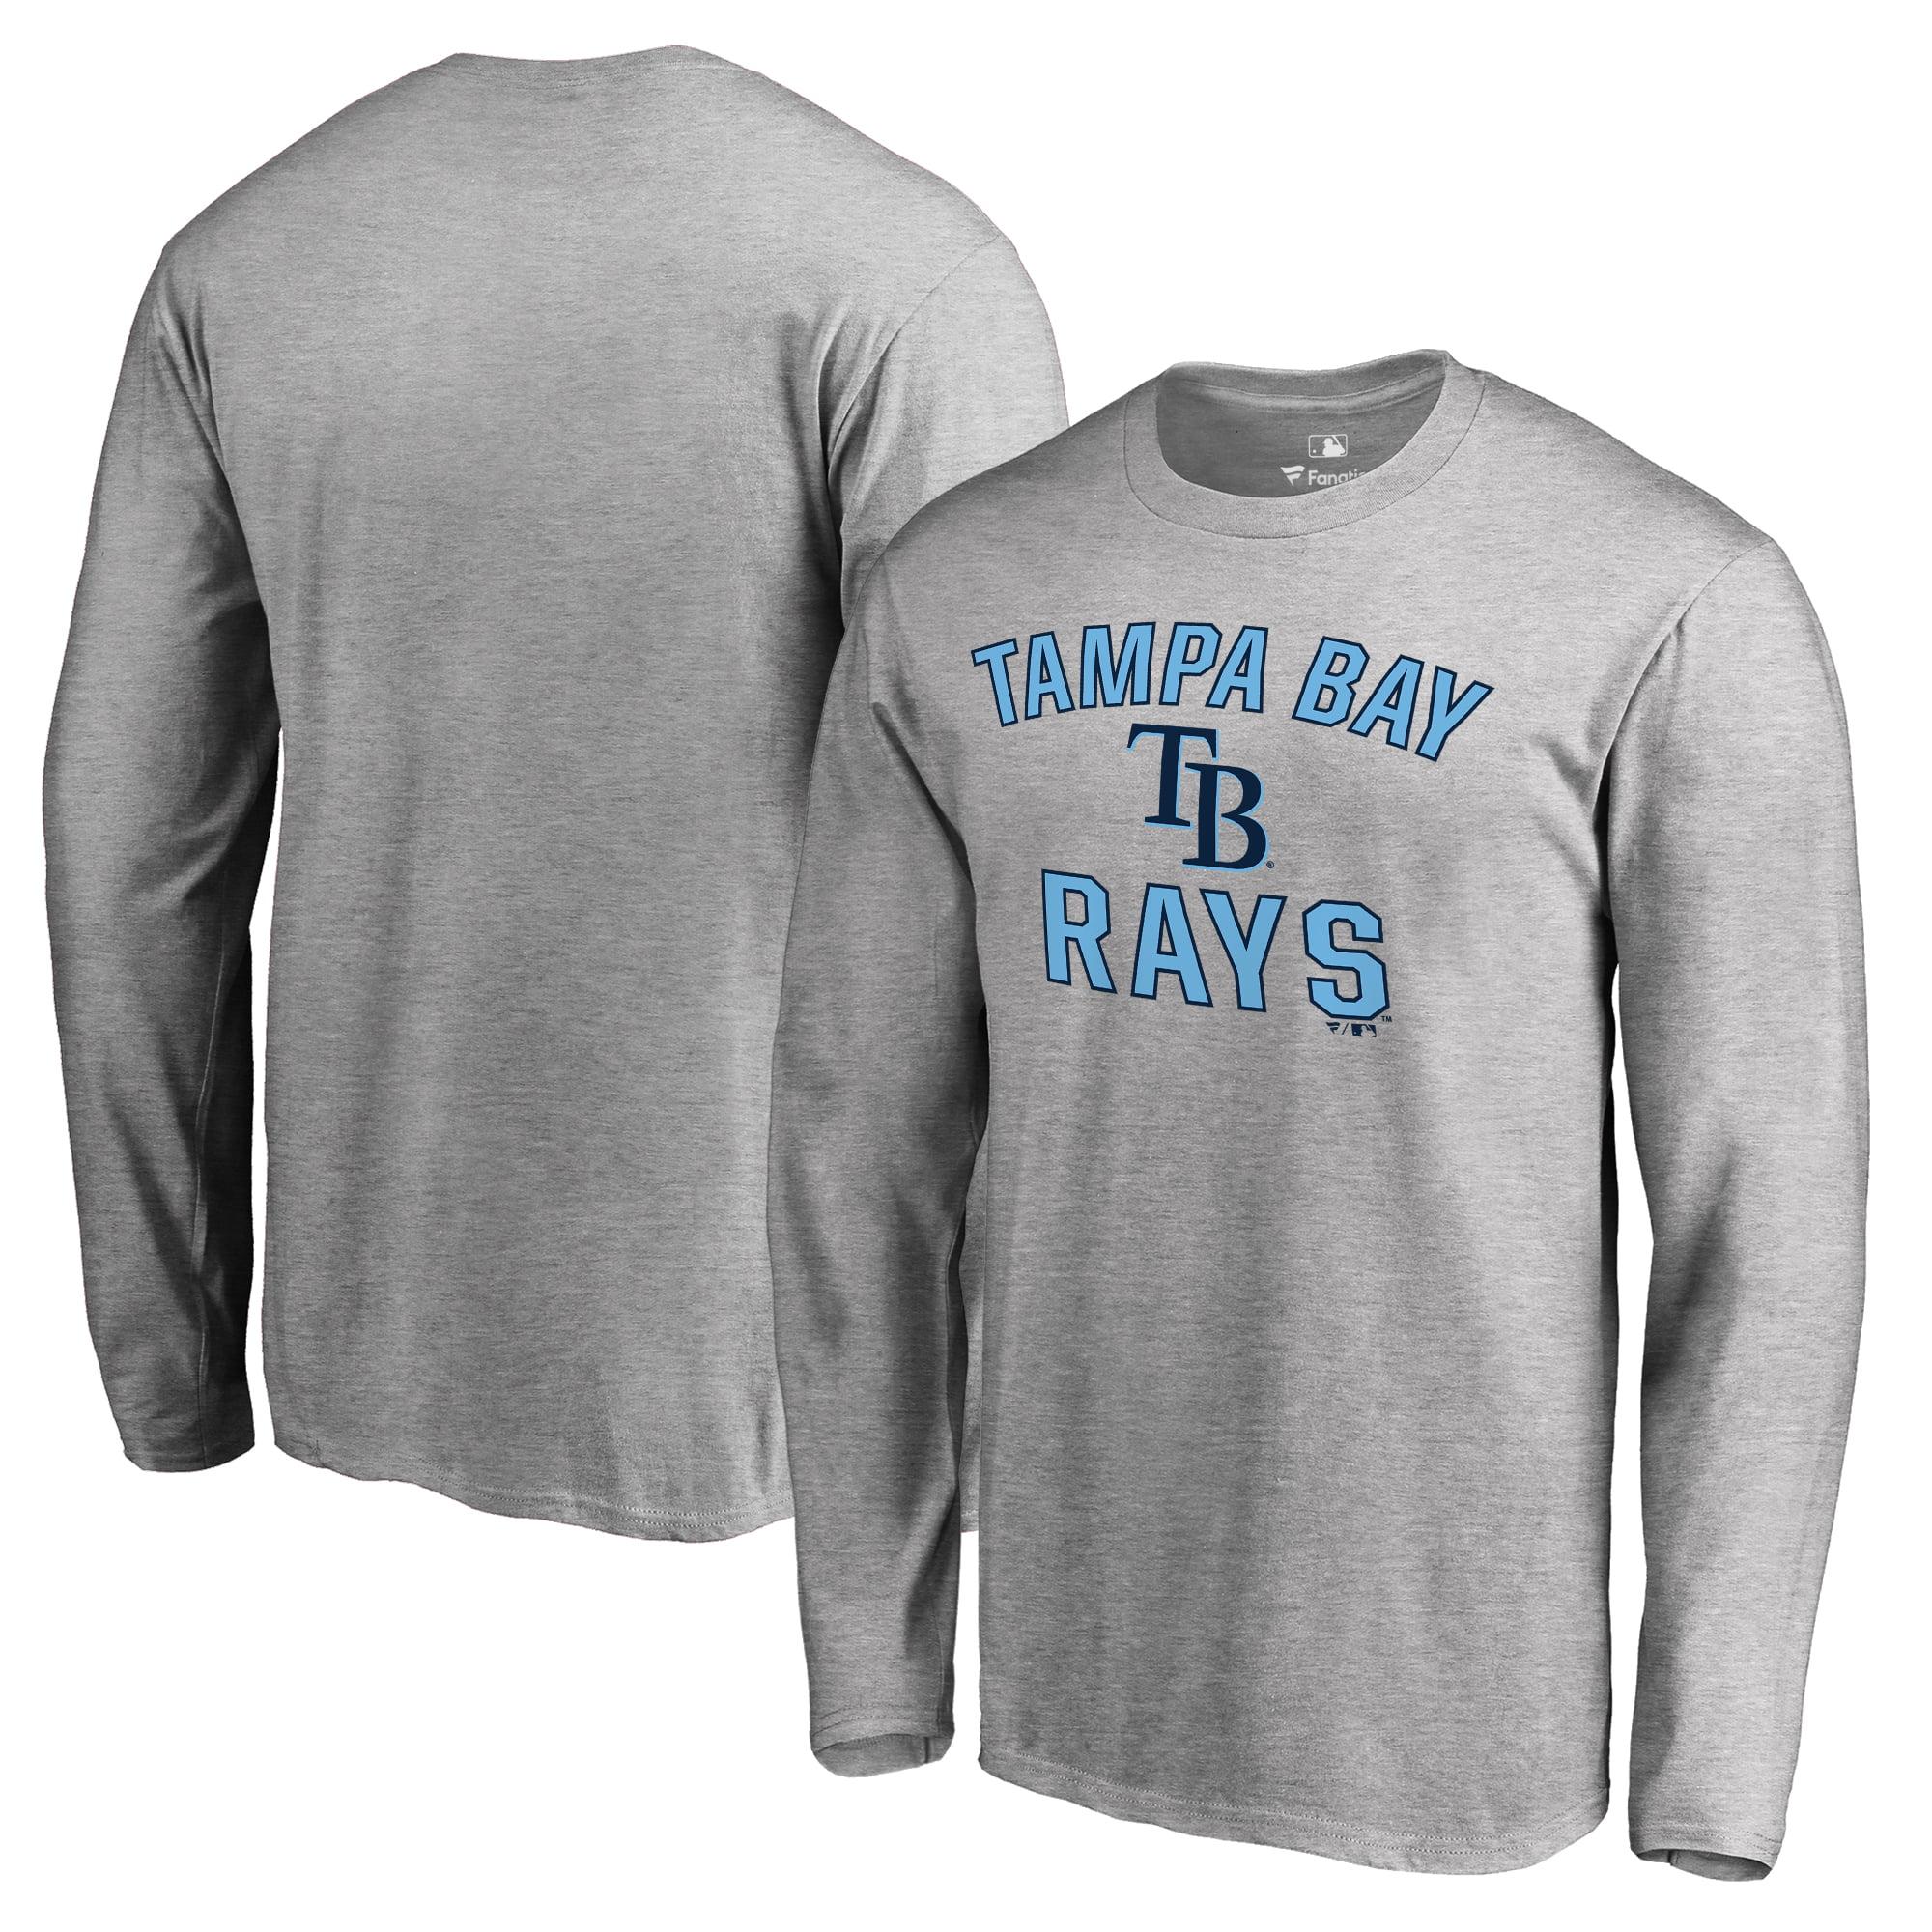 Tampa Bay Rays Big & Tall Victory Arch Long Sleeve T-Shirt - Ash